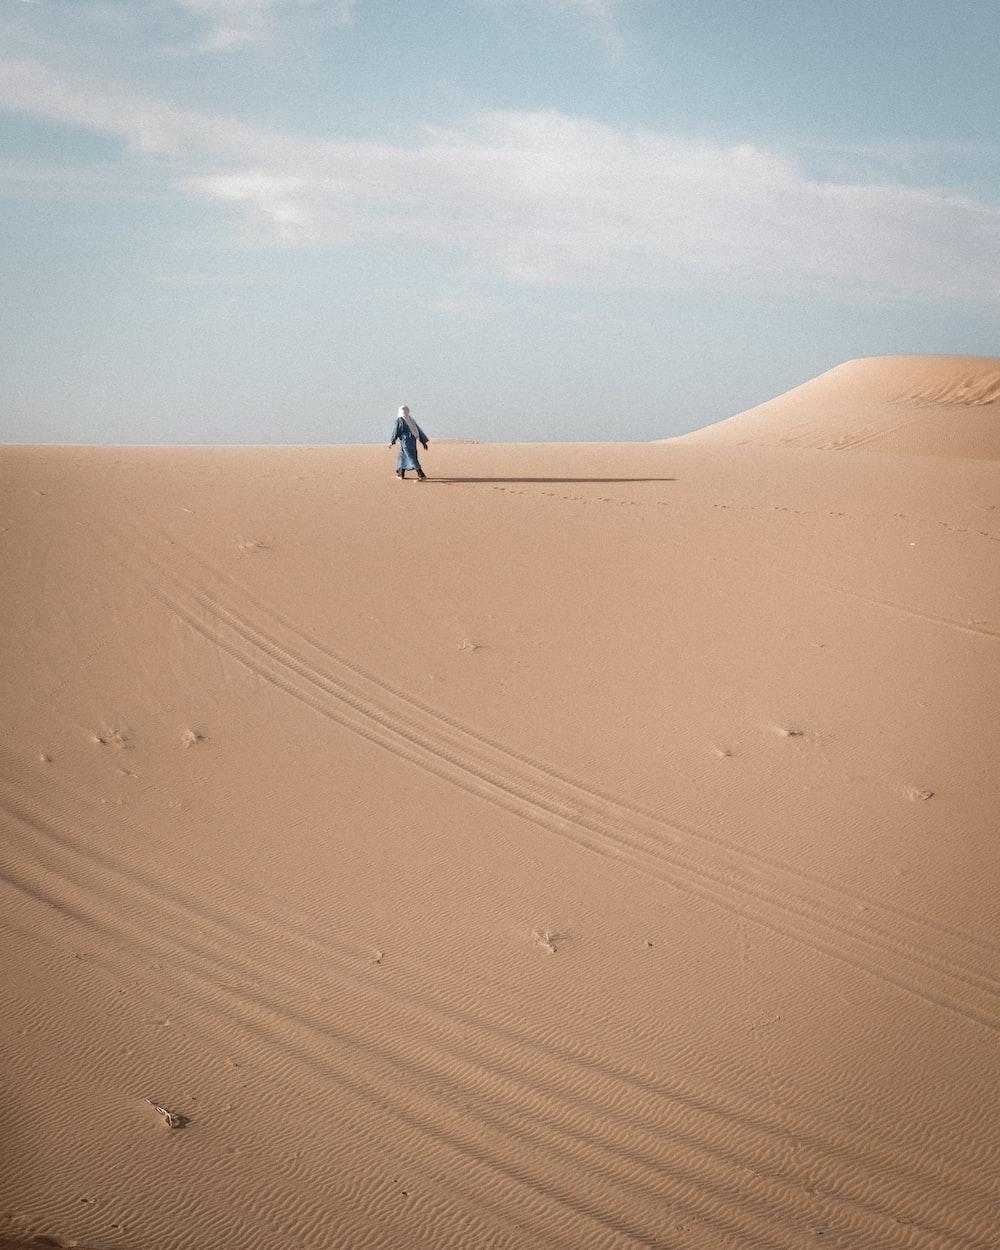 person in black jacket walking on desert during daytime